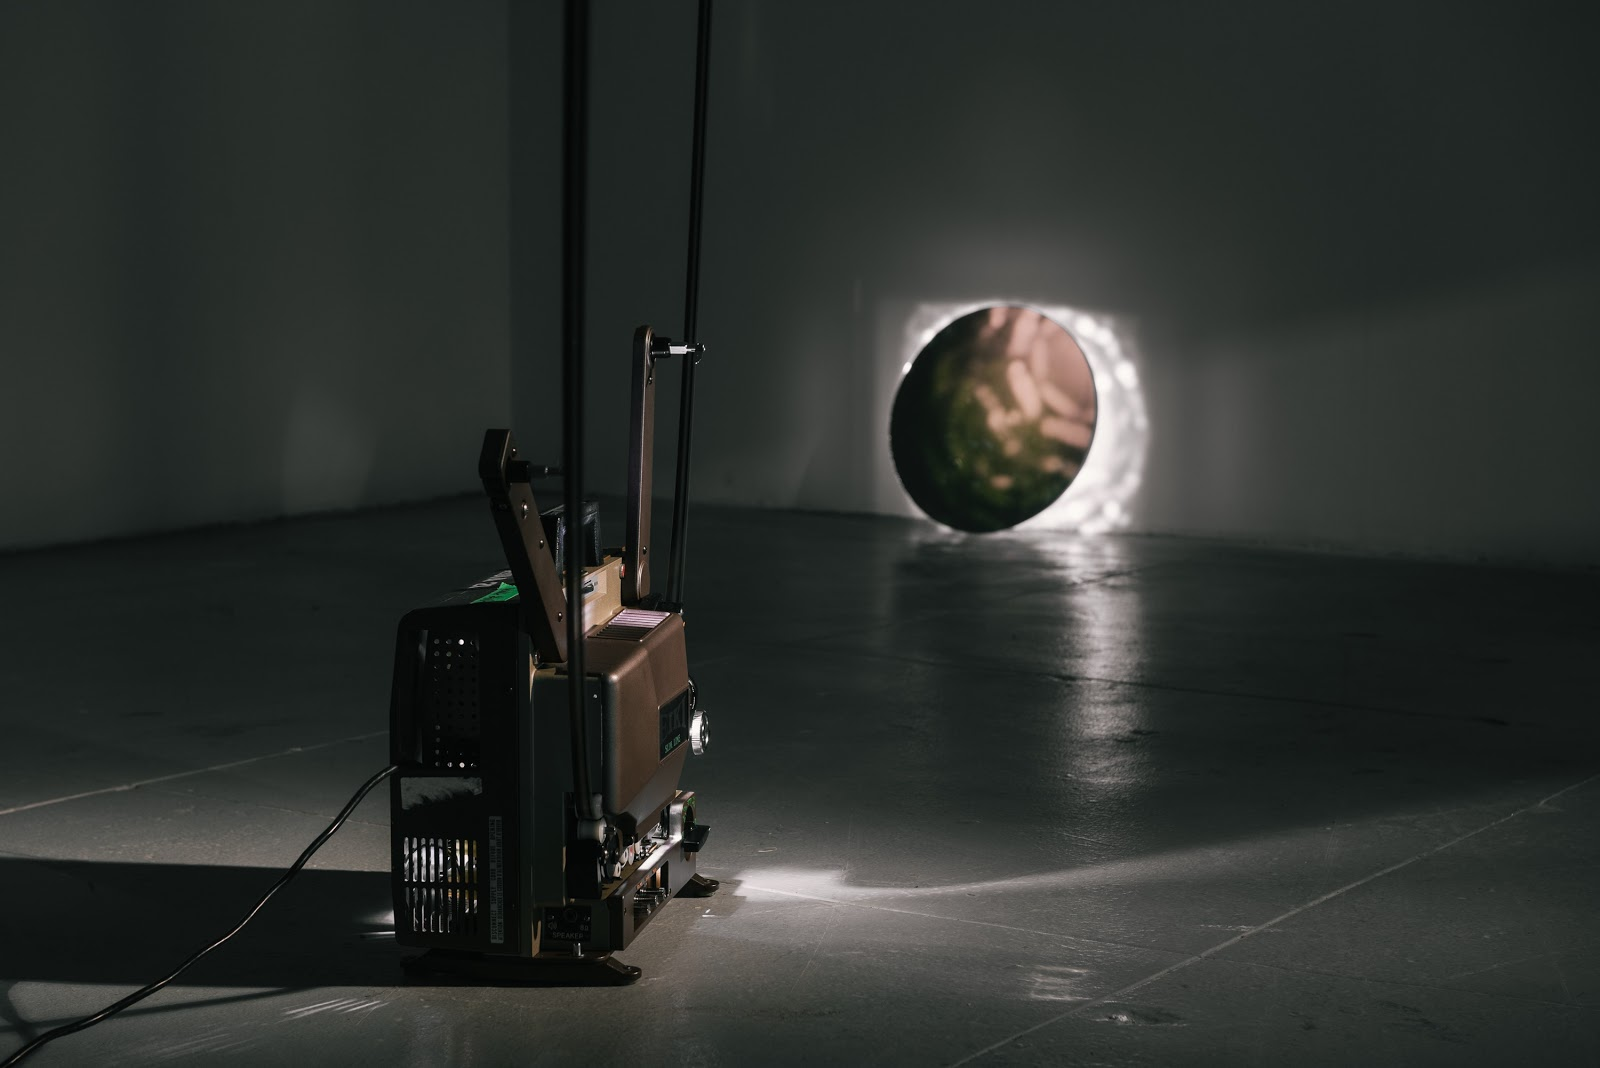 Nung-Hsin Hu, Eternal Return, 2019. Arctic Sunlight 16mm Film Loop, 16mm Analog Projector, A Round Mirror. Courtesy Of The Artist.